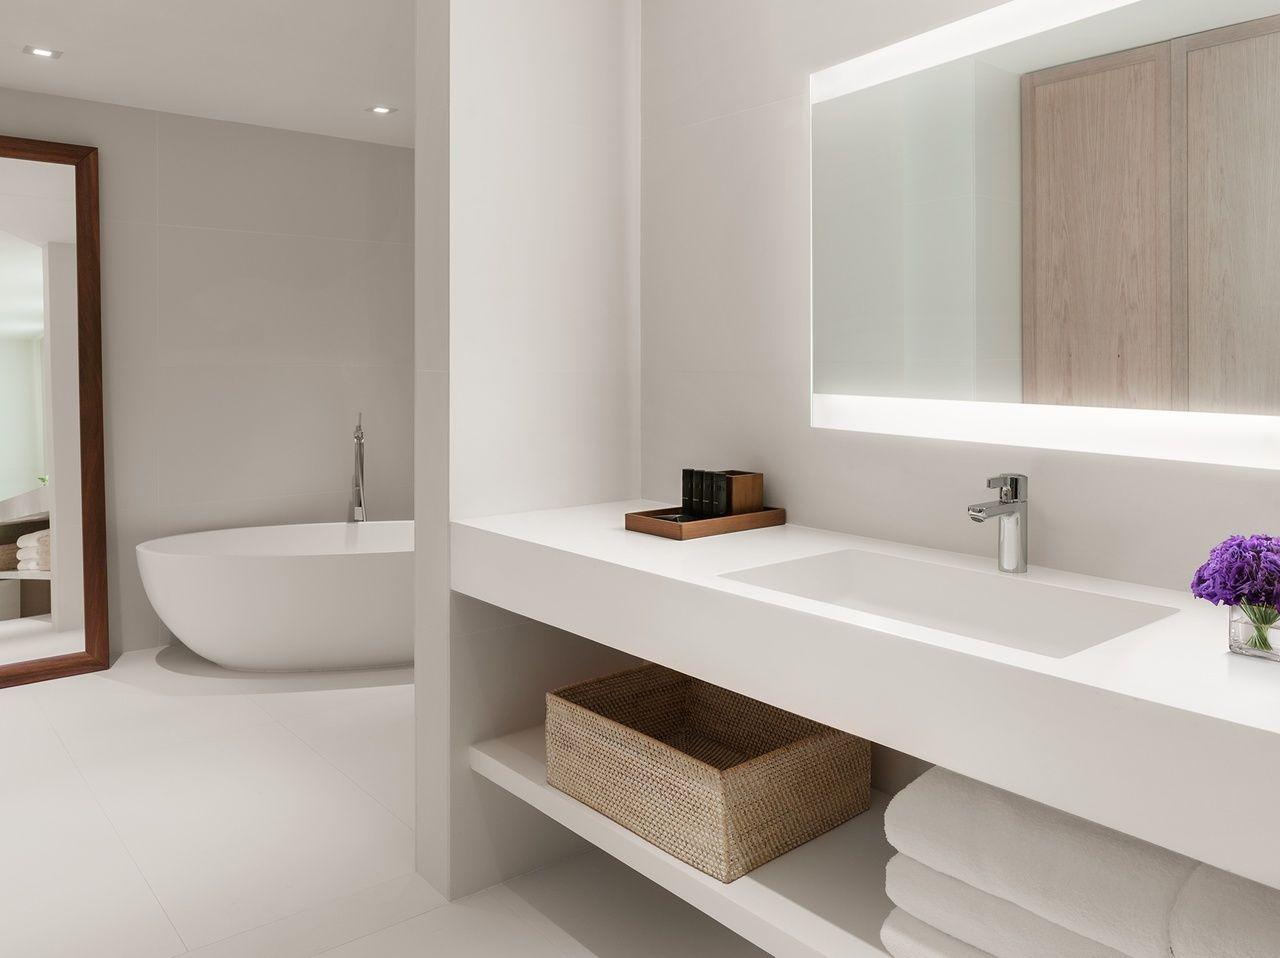 The miami beach edition spiegel badkamers en badkamer